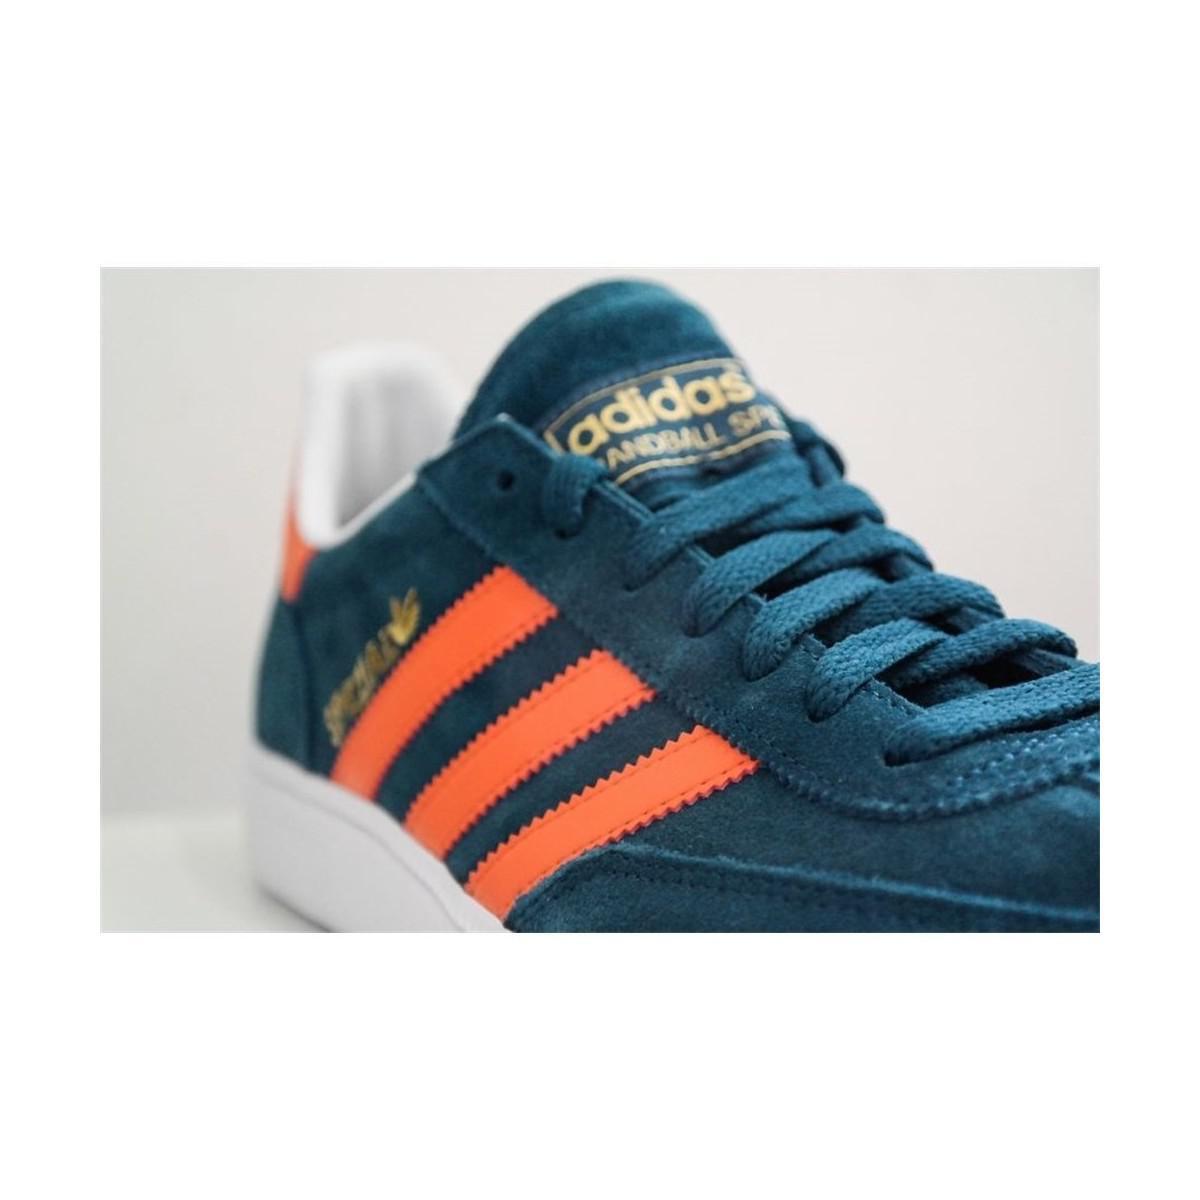 new arrival 2622f 7bc21 Adidas Originals Spezial Mineral Super Orange Men s Shoes (trainers ...